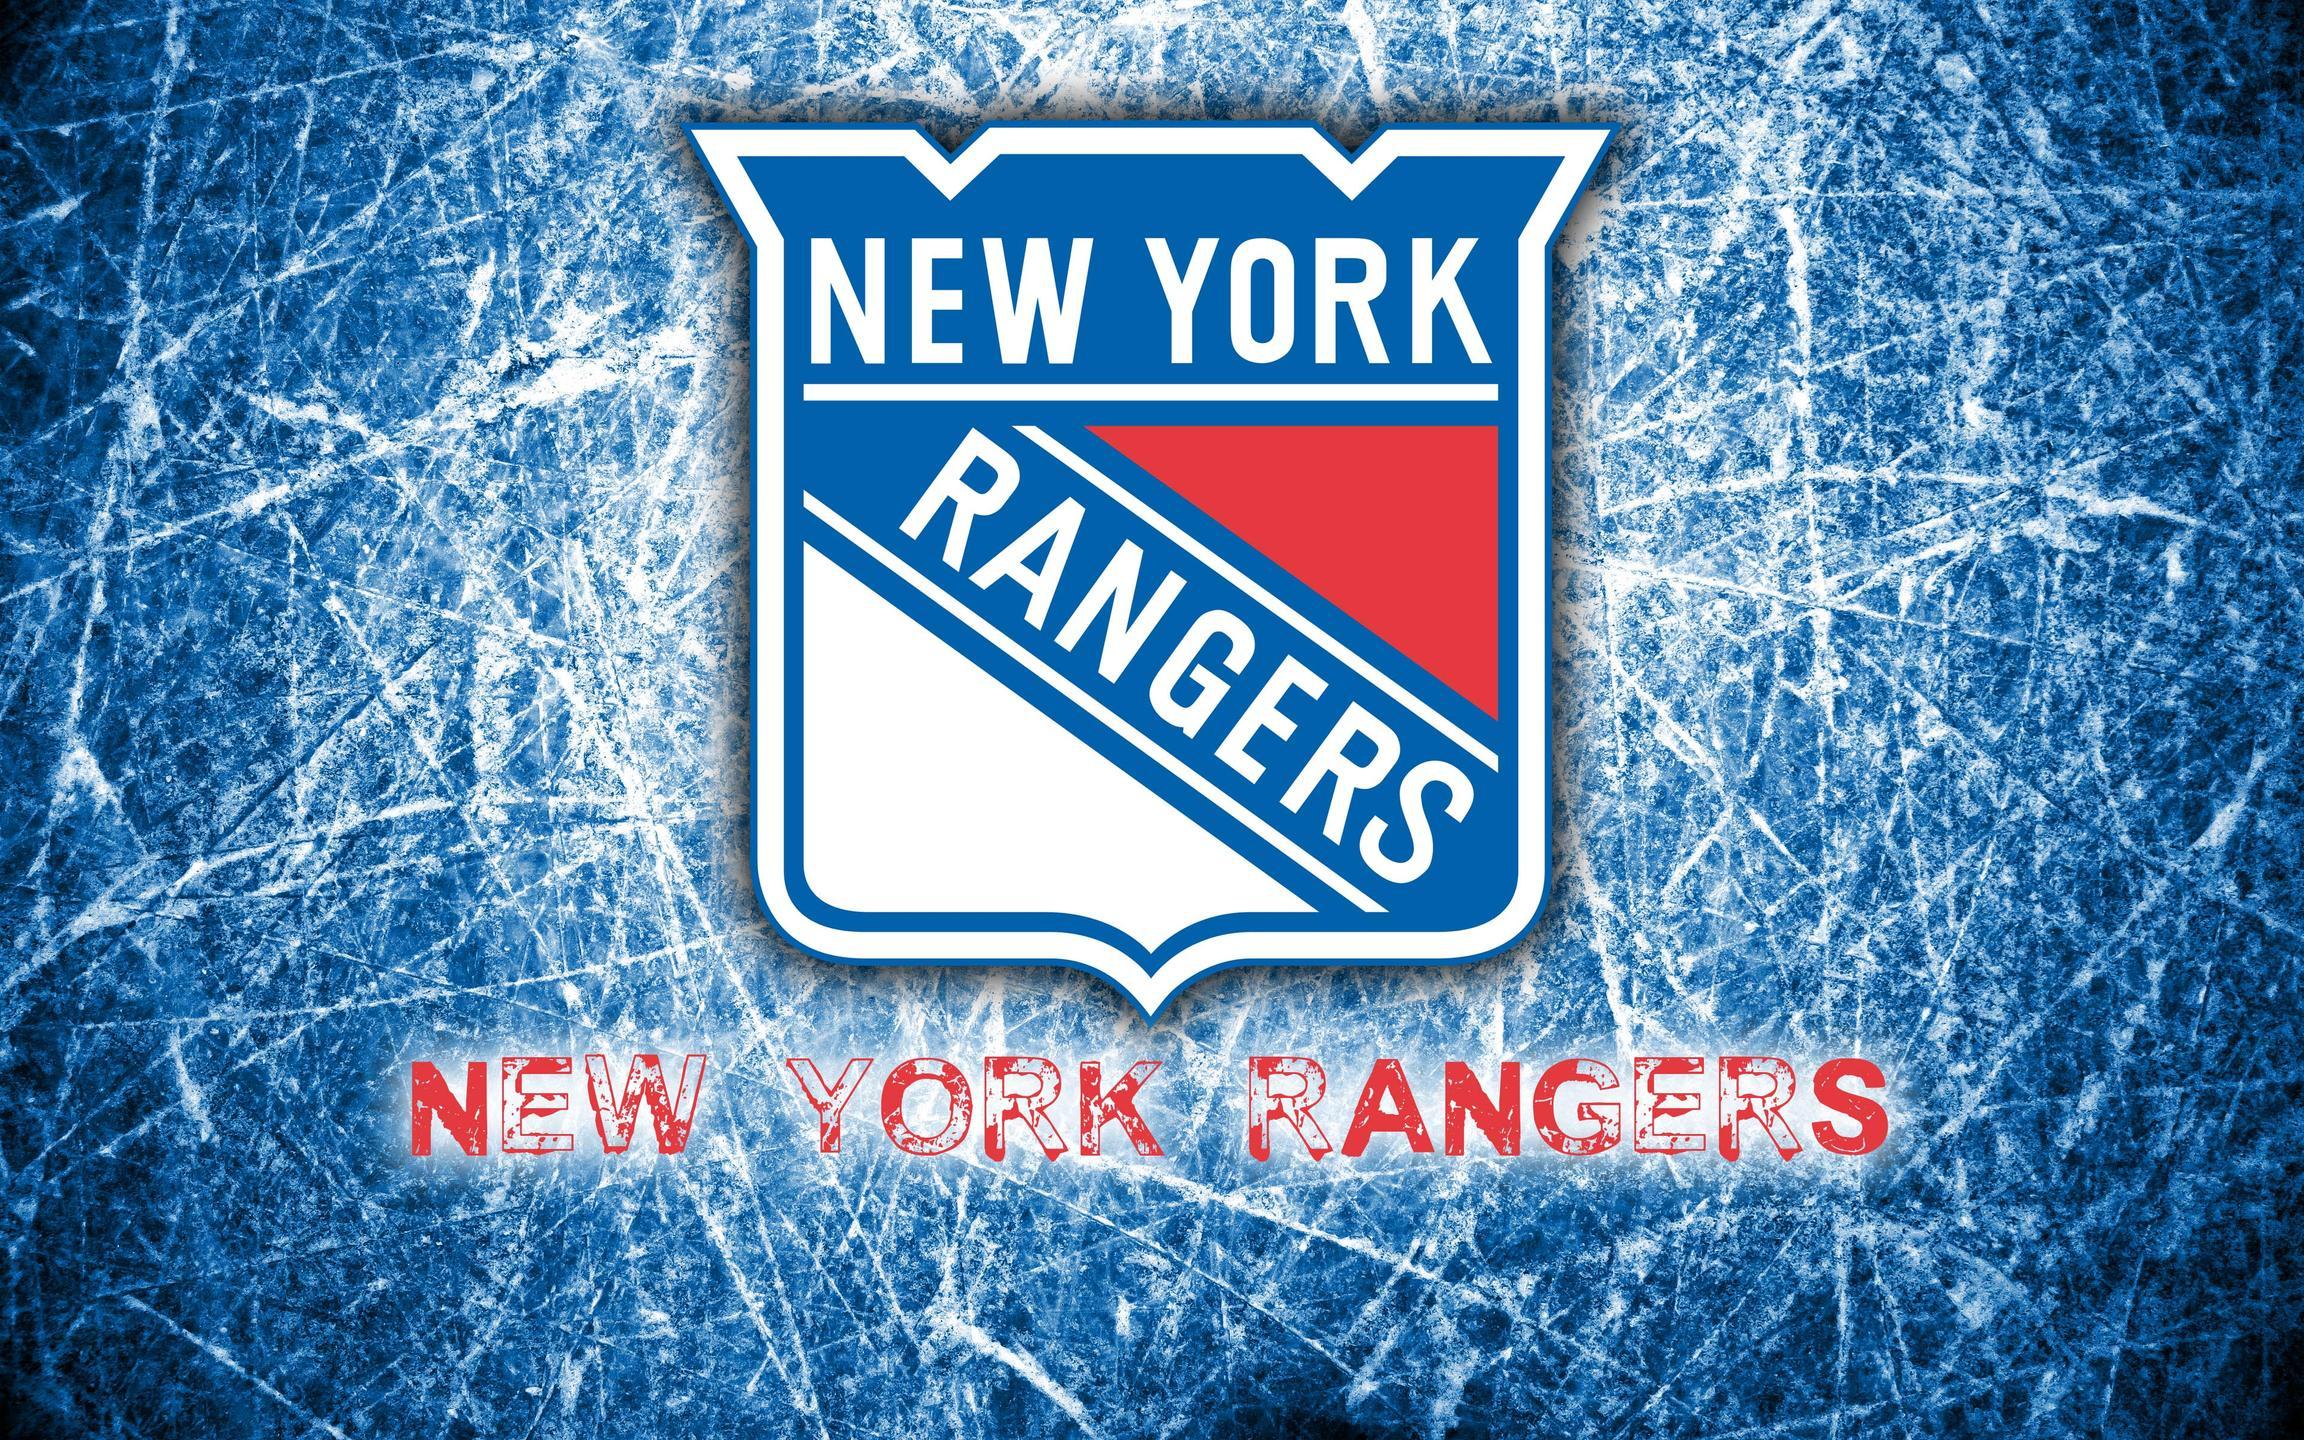 New York Rangers 2014 Logo Wallpaper Wide or HD Sports Wallpapers 2304x1440